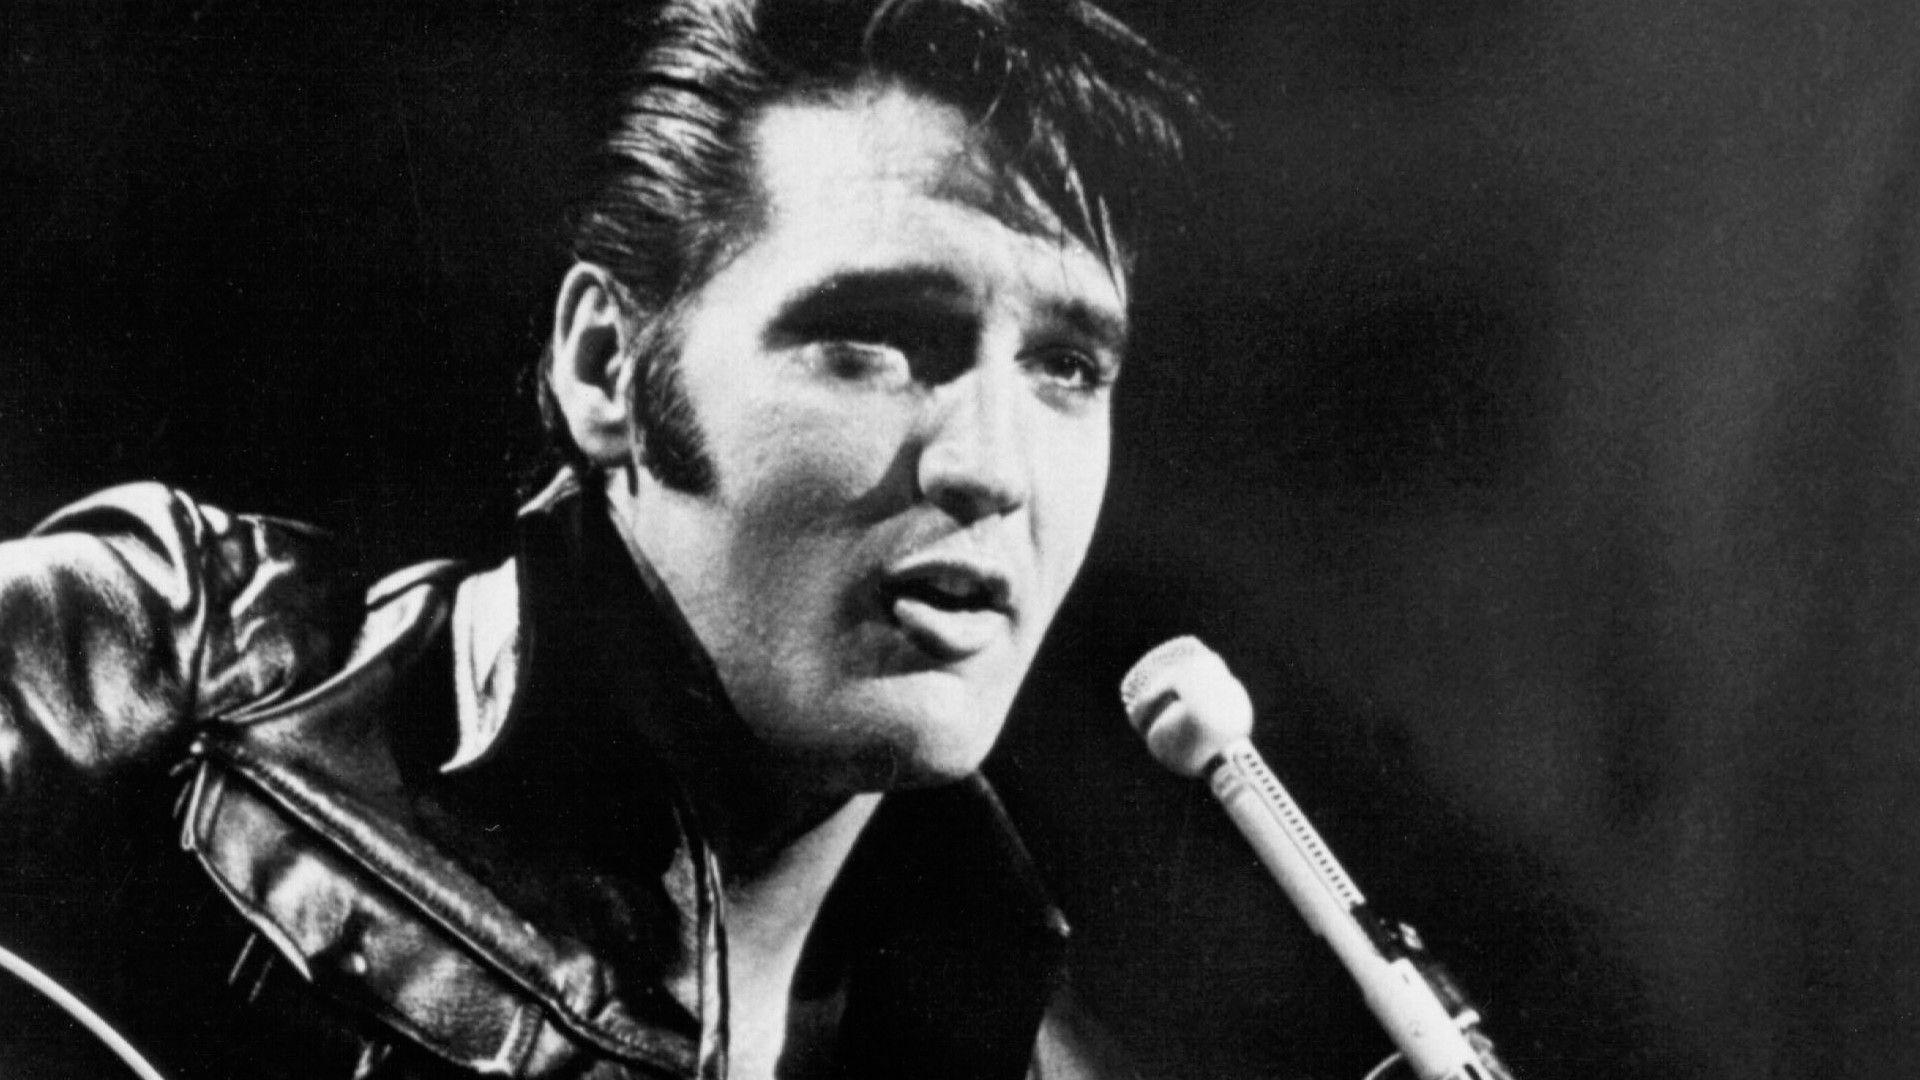 Elvis Presley Wallpapers Top Free Elvis Presley Backgrounds Wallpaperaccess